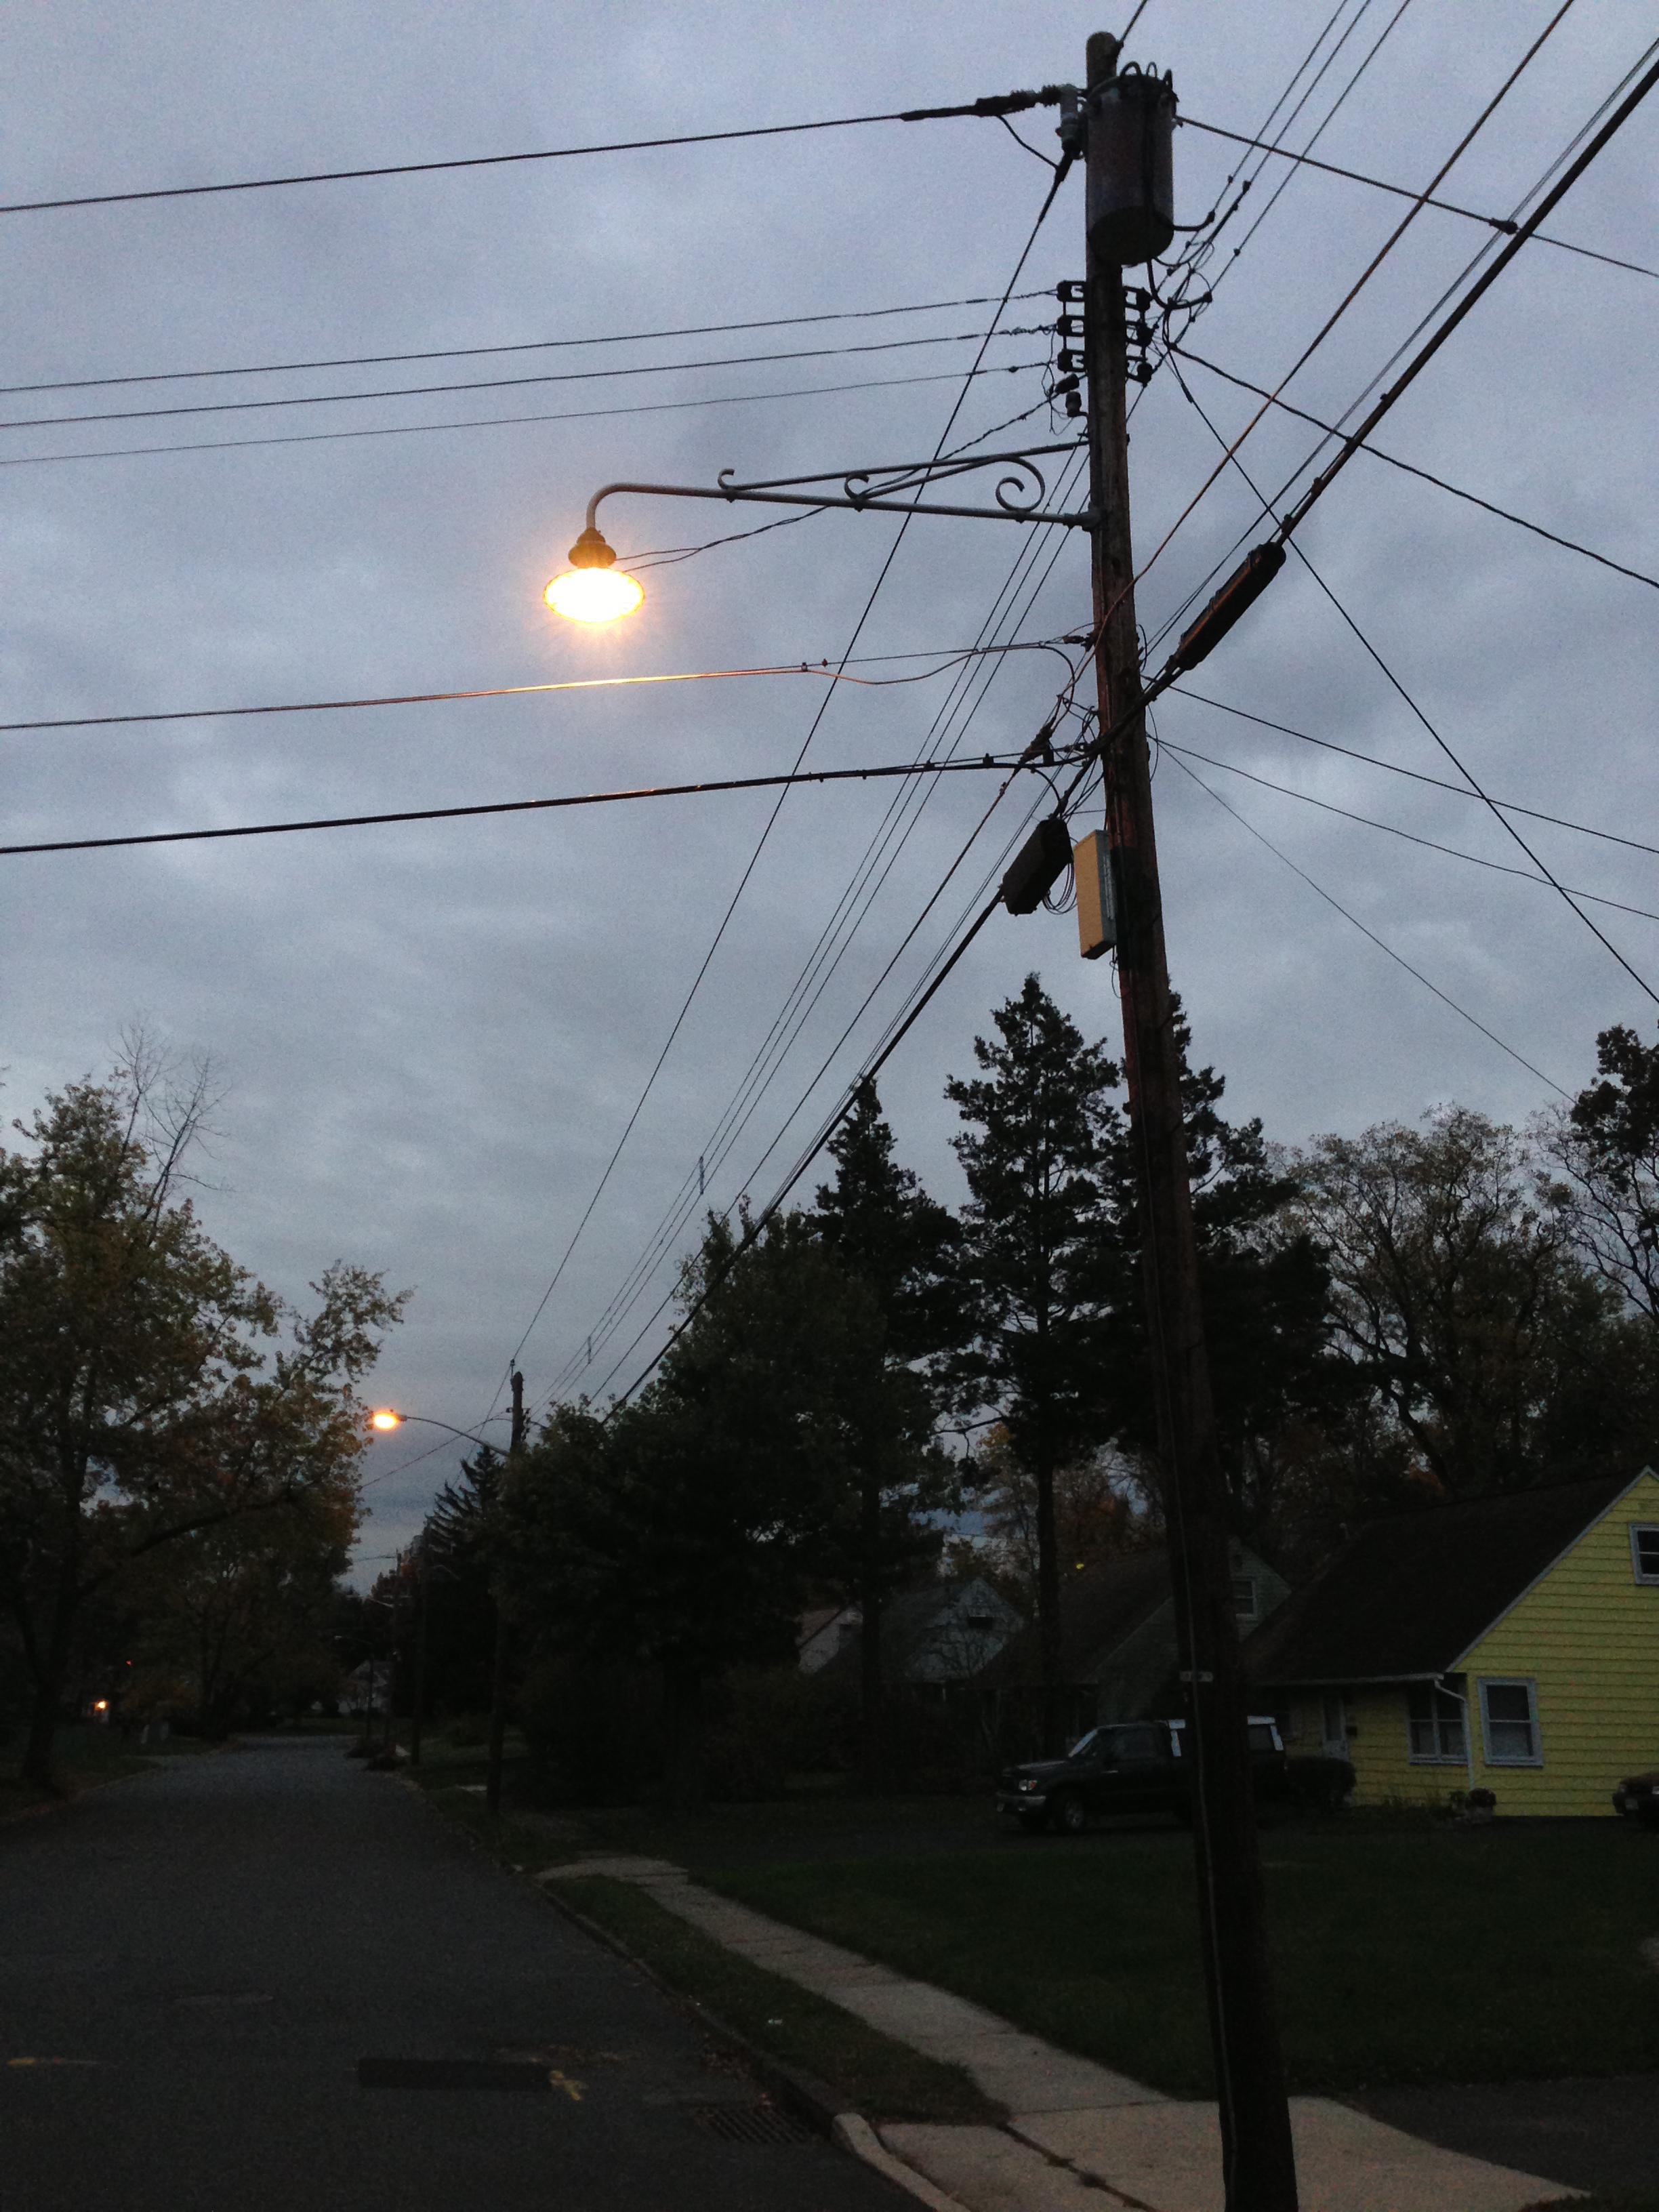 Street light and power light TV interference